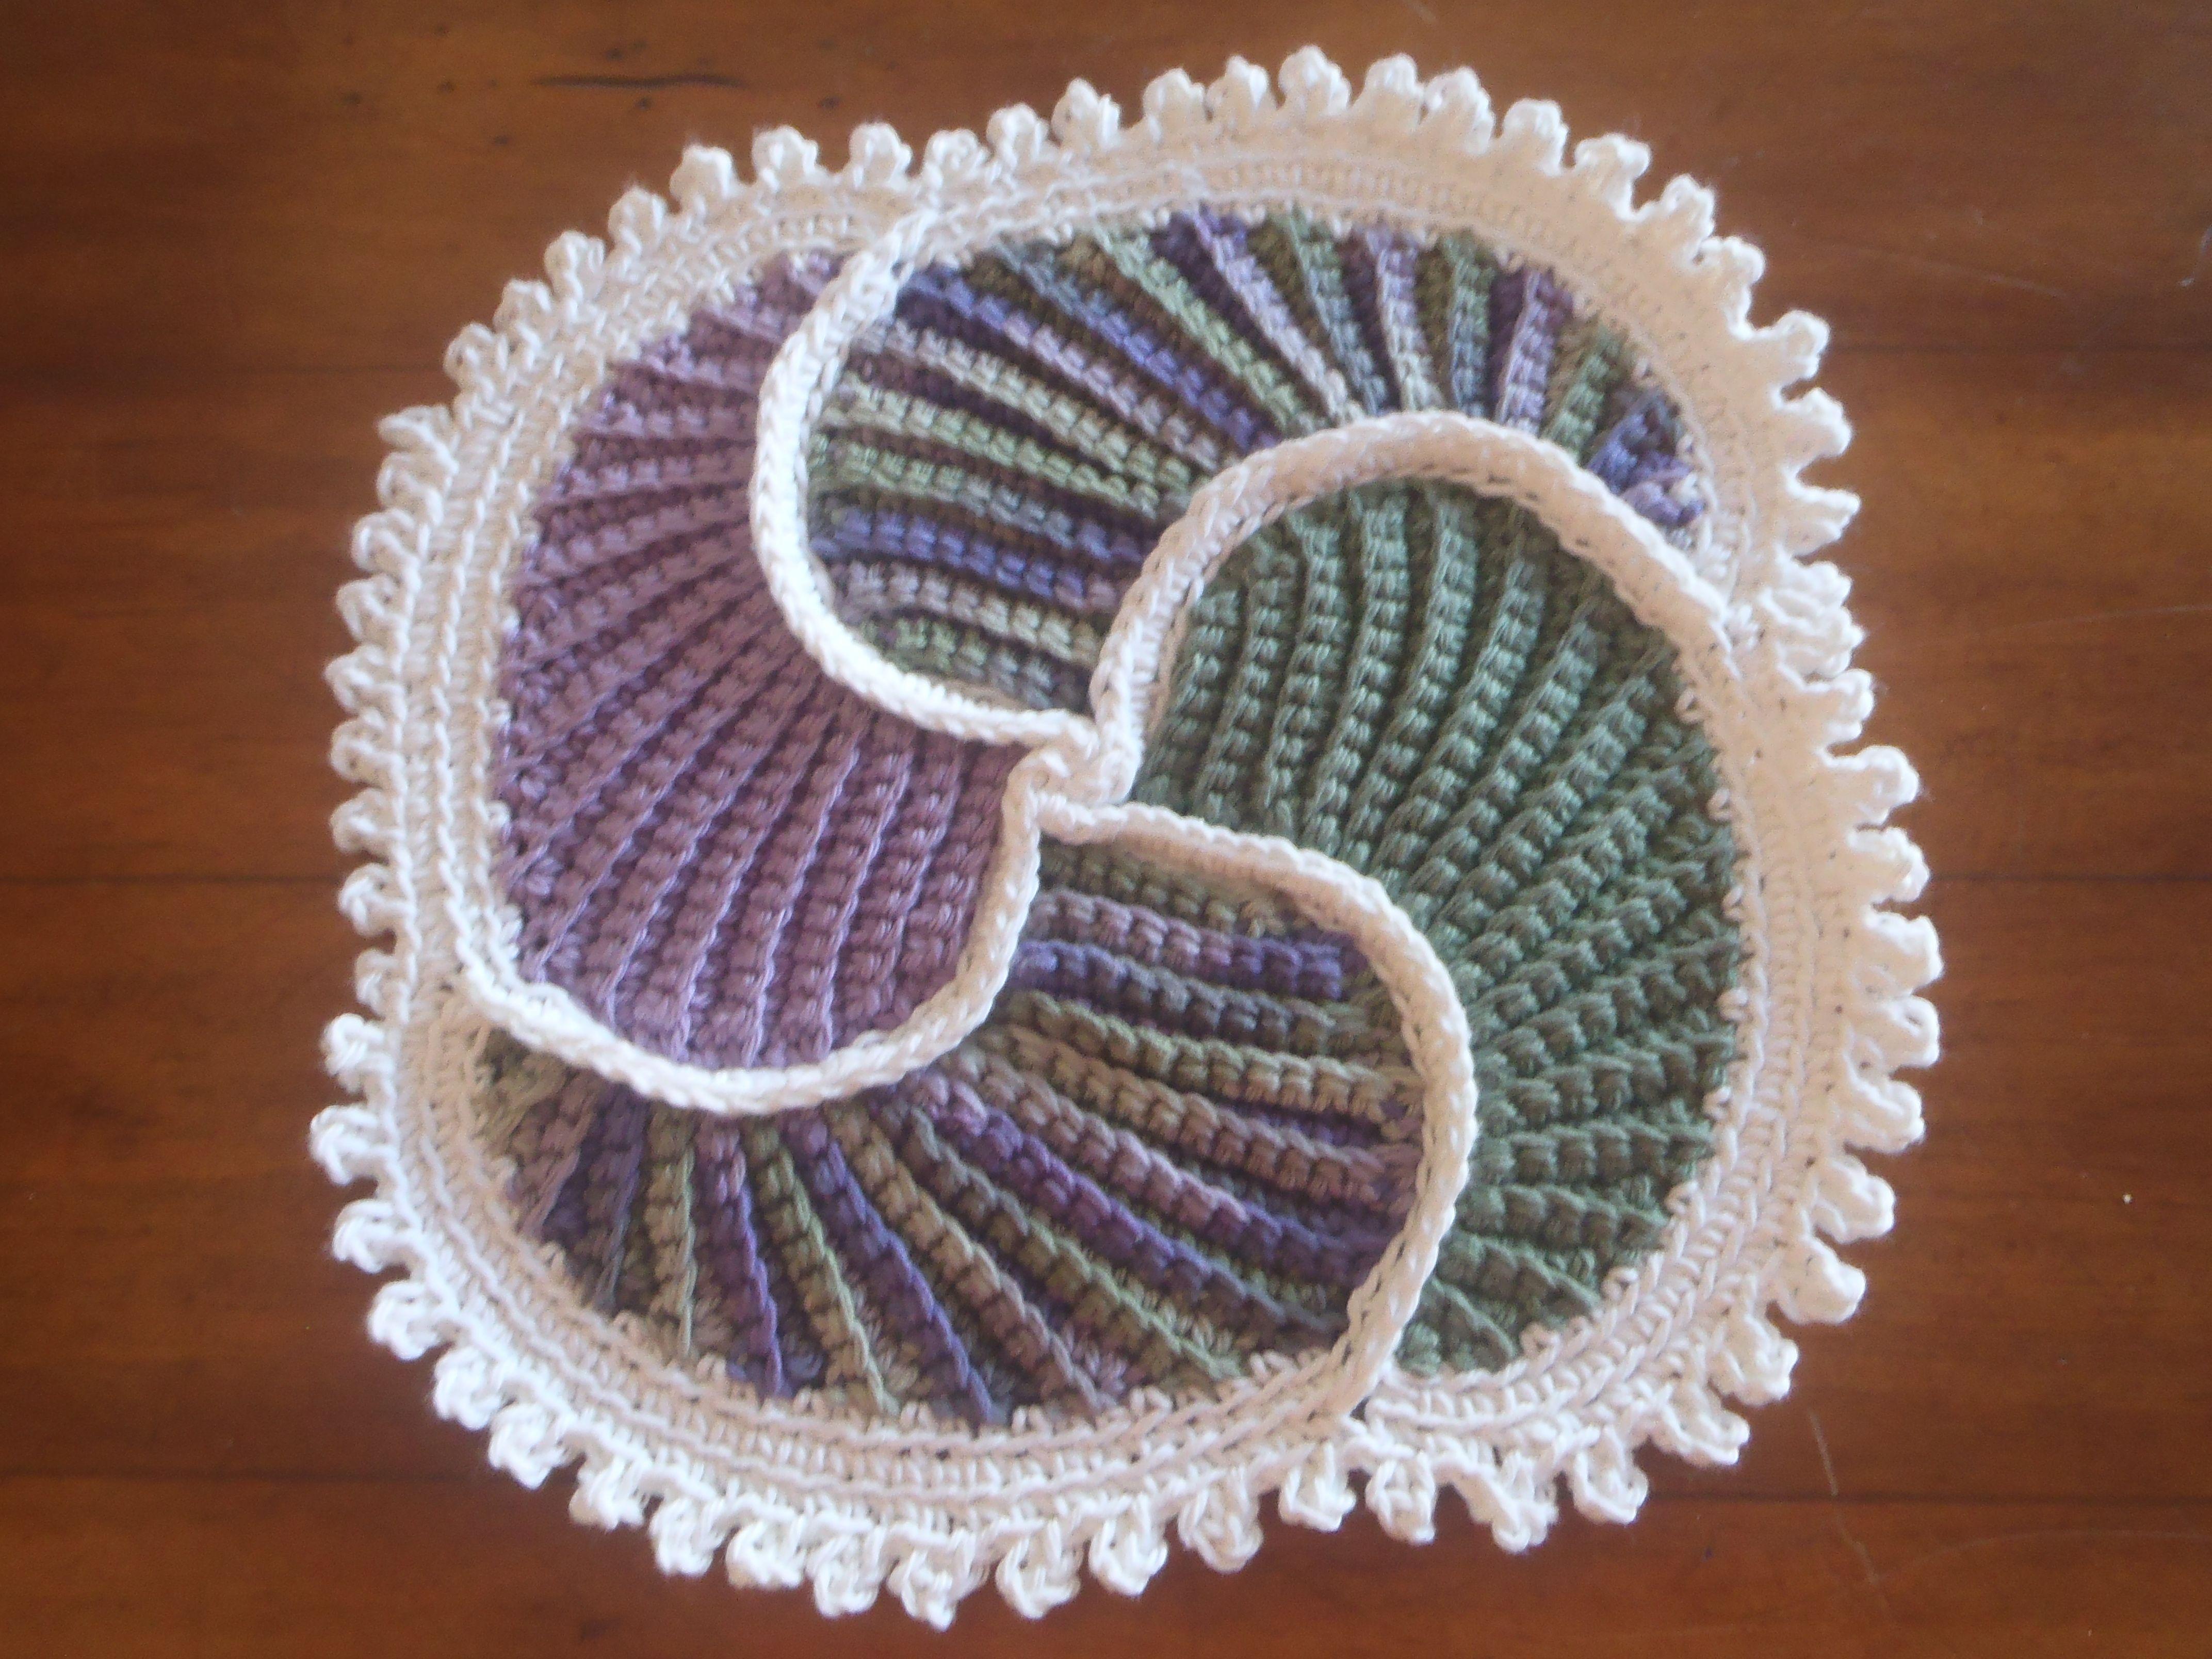 Spiral Trivet, inspired by The Picasso Potholder | FREEFORM crochet ...